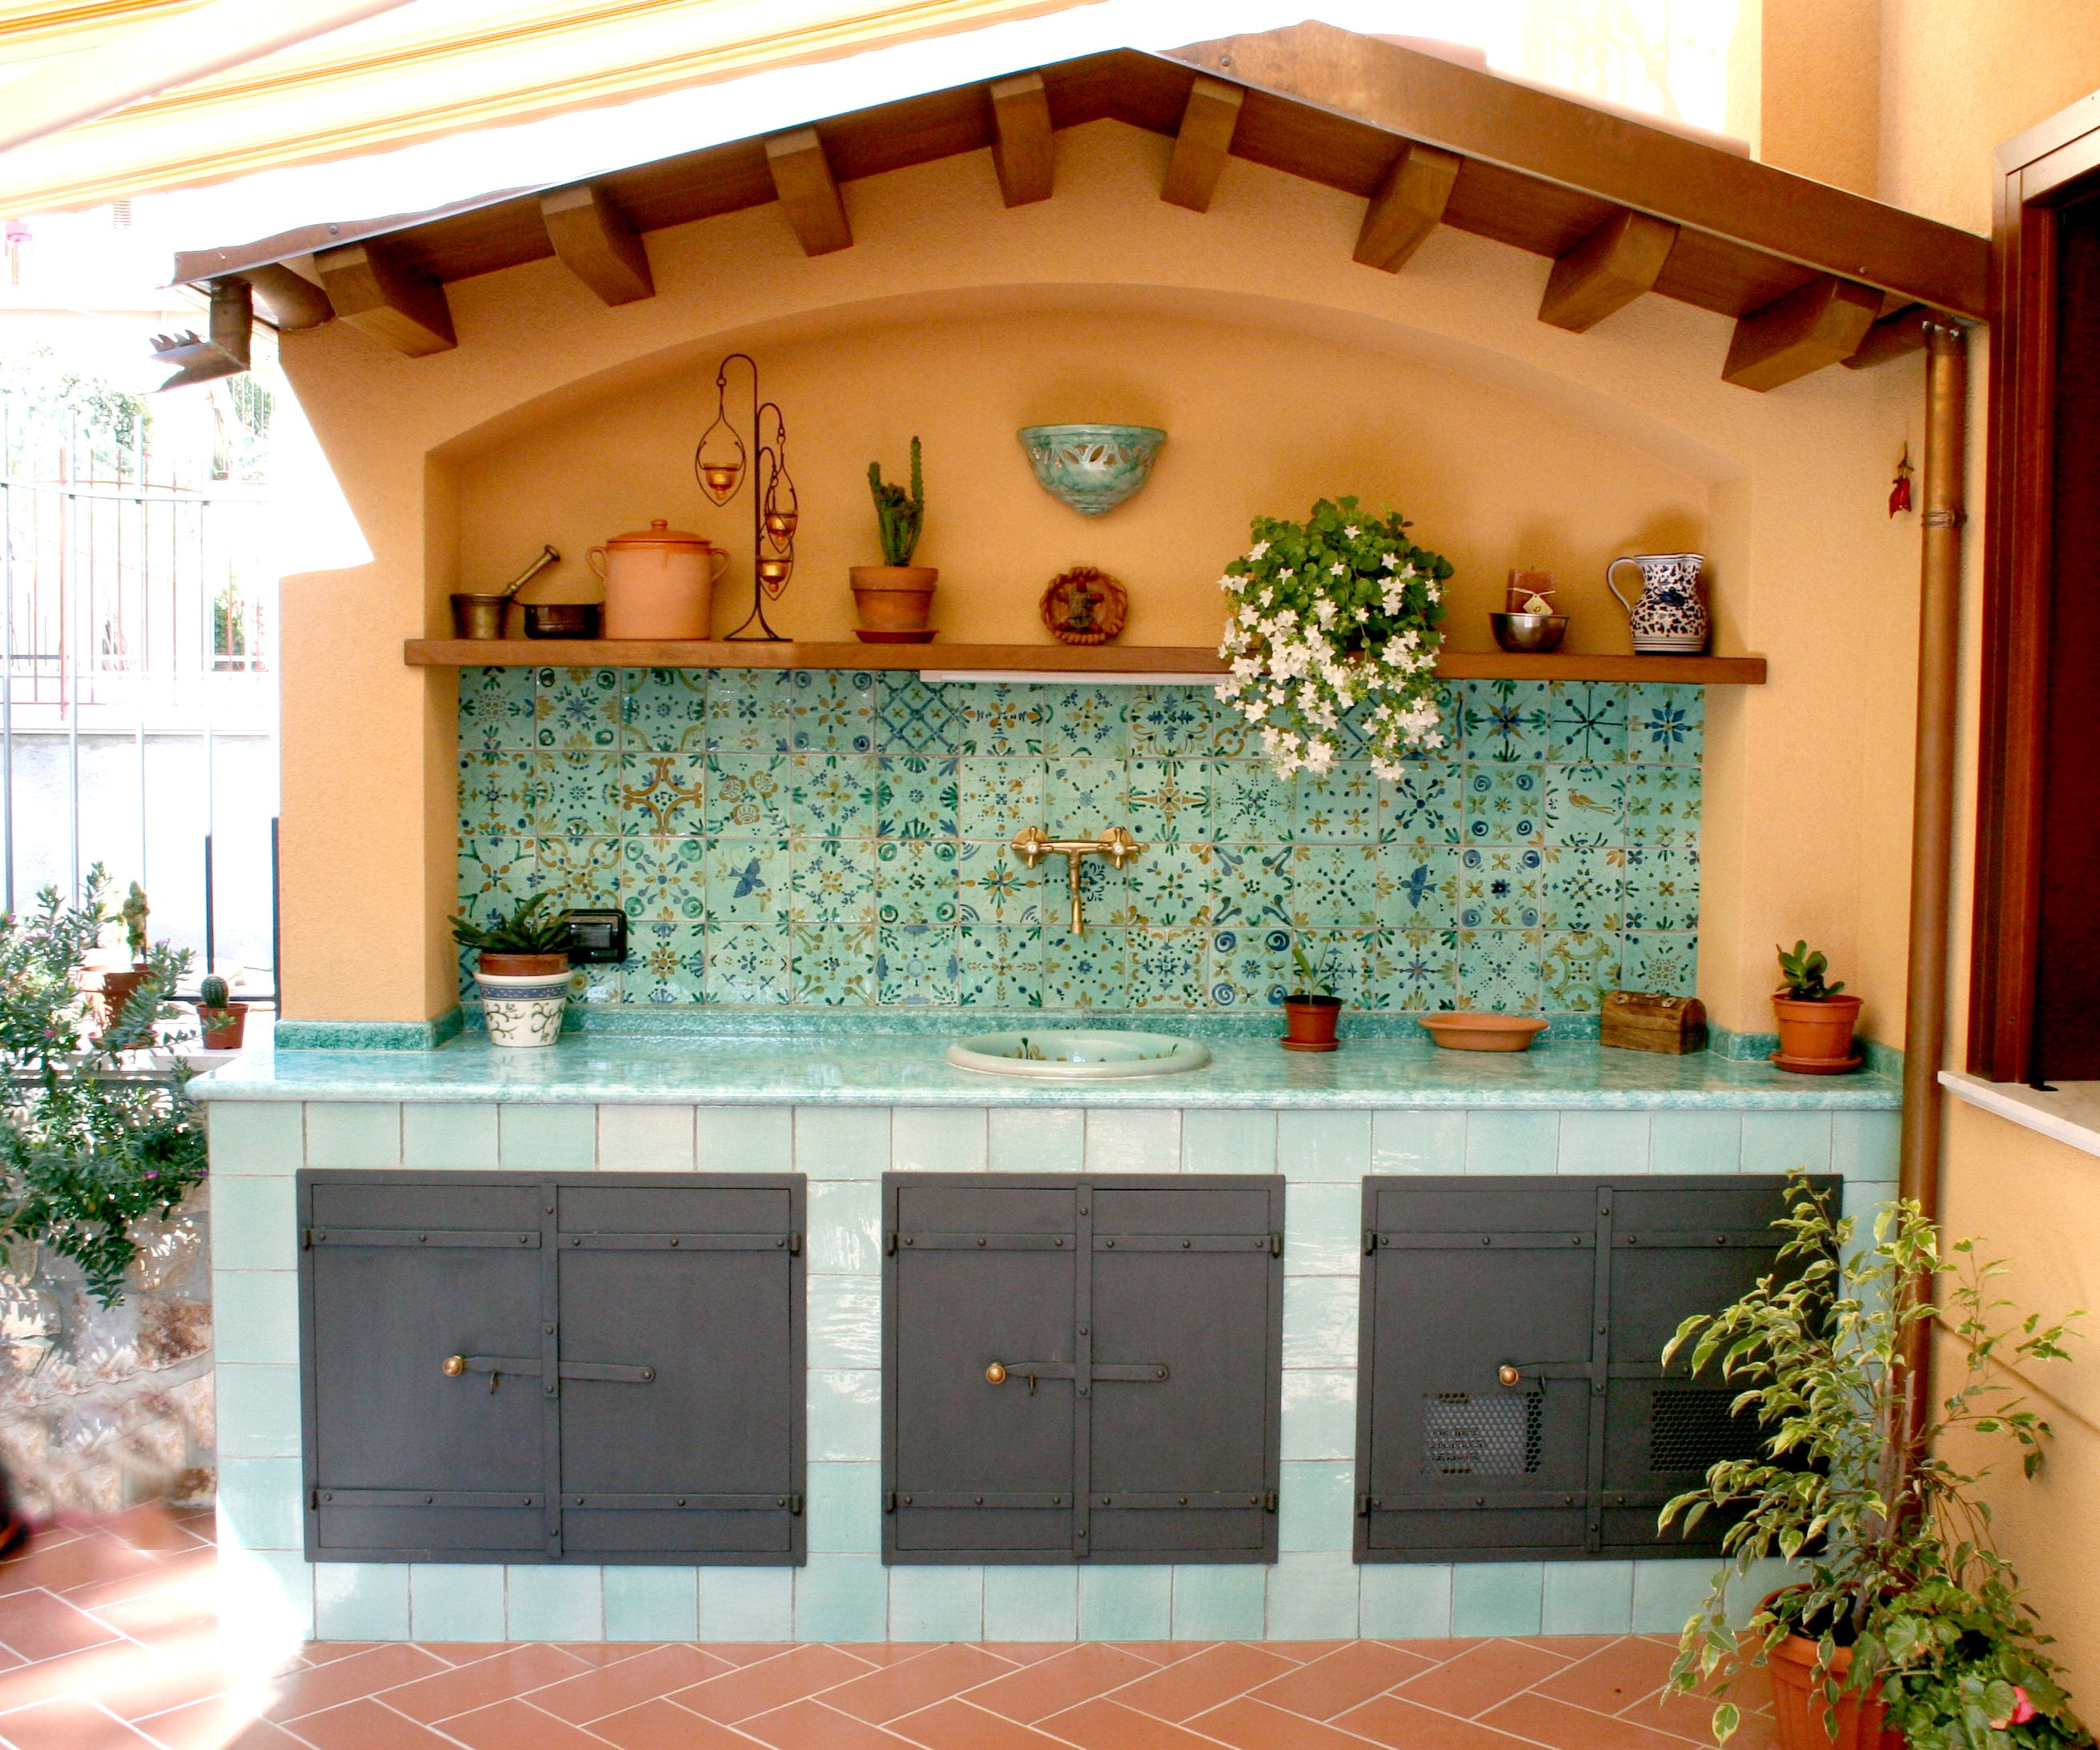 Cucina esterna decoro mediterraneo ceramics pottery - Cucina in muratura esterna ...